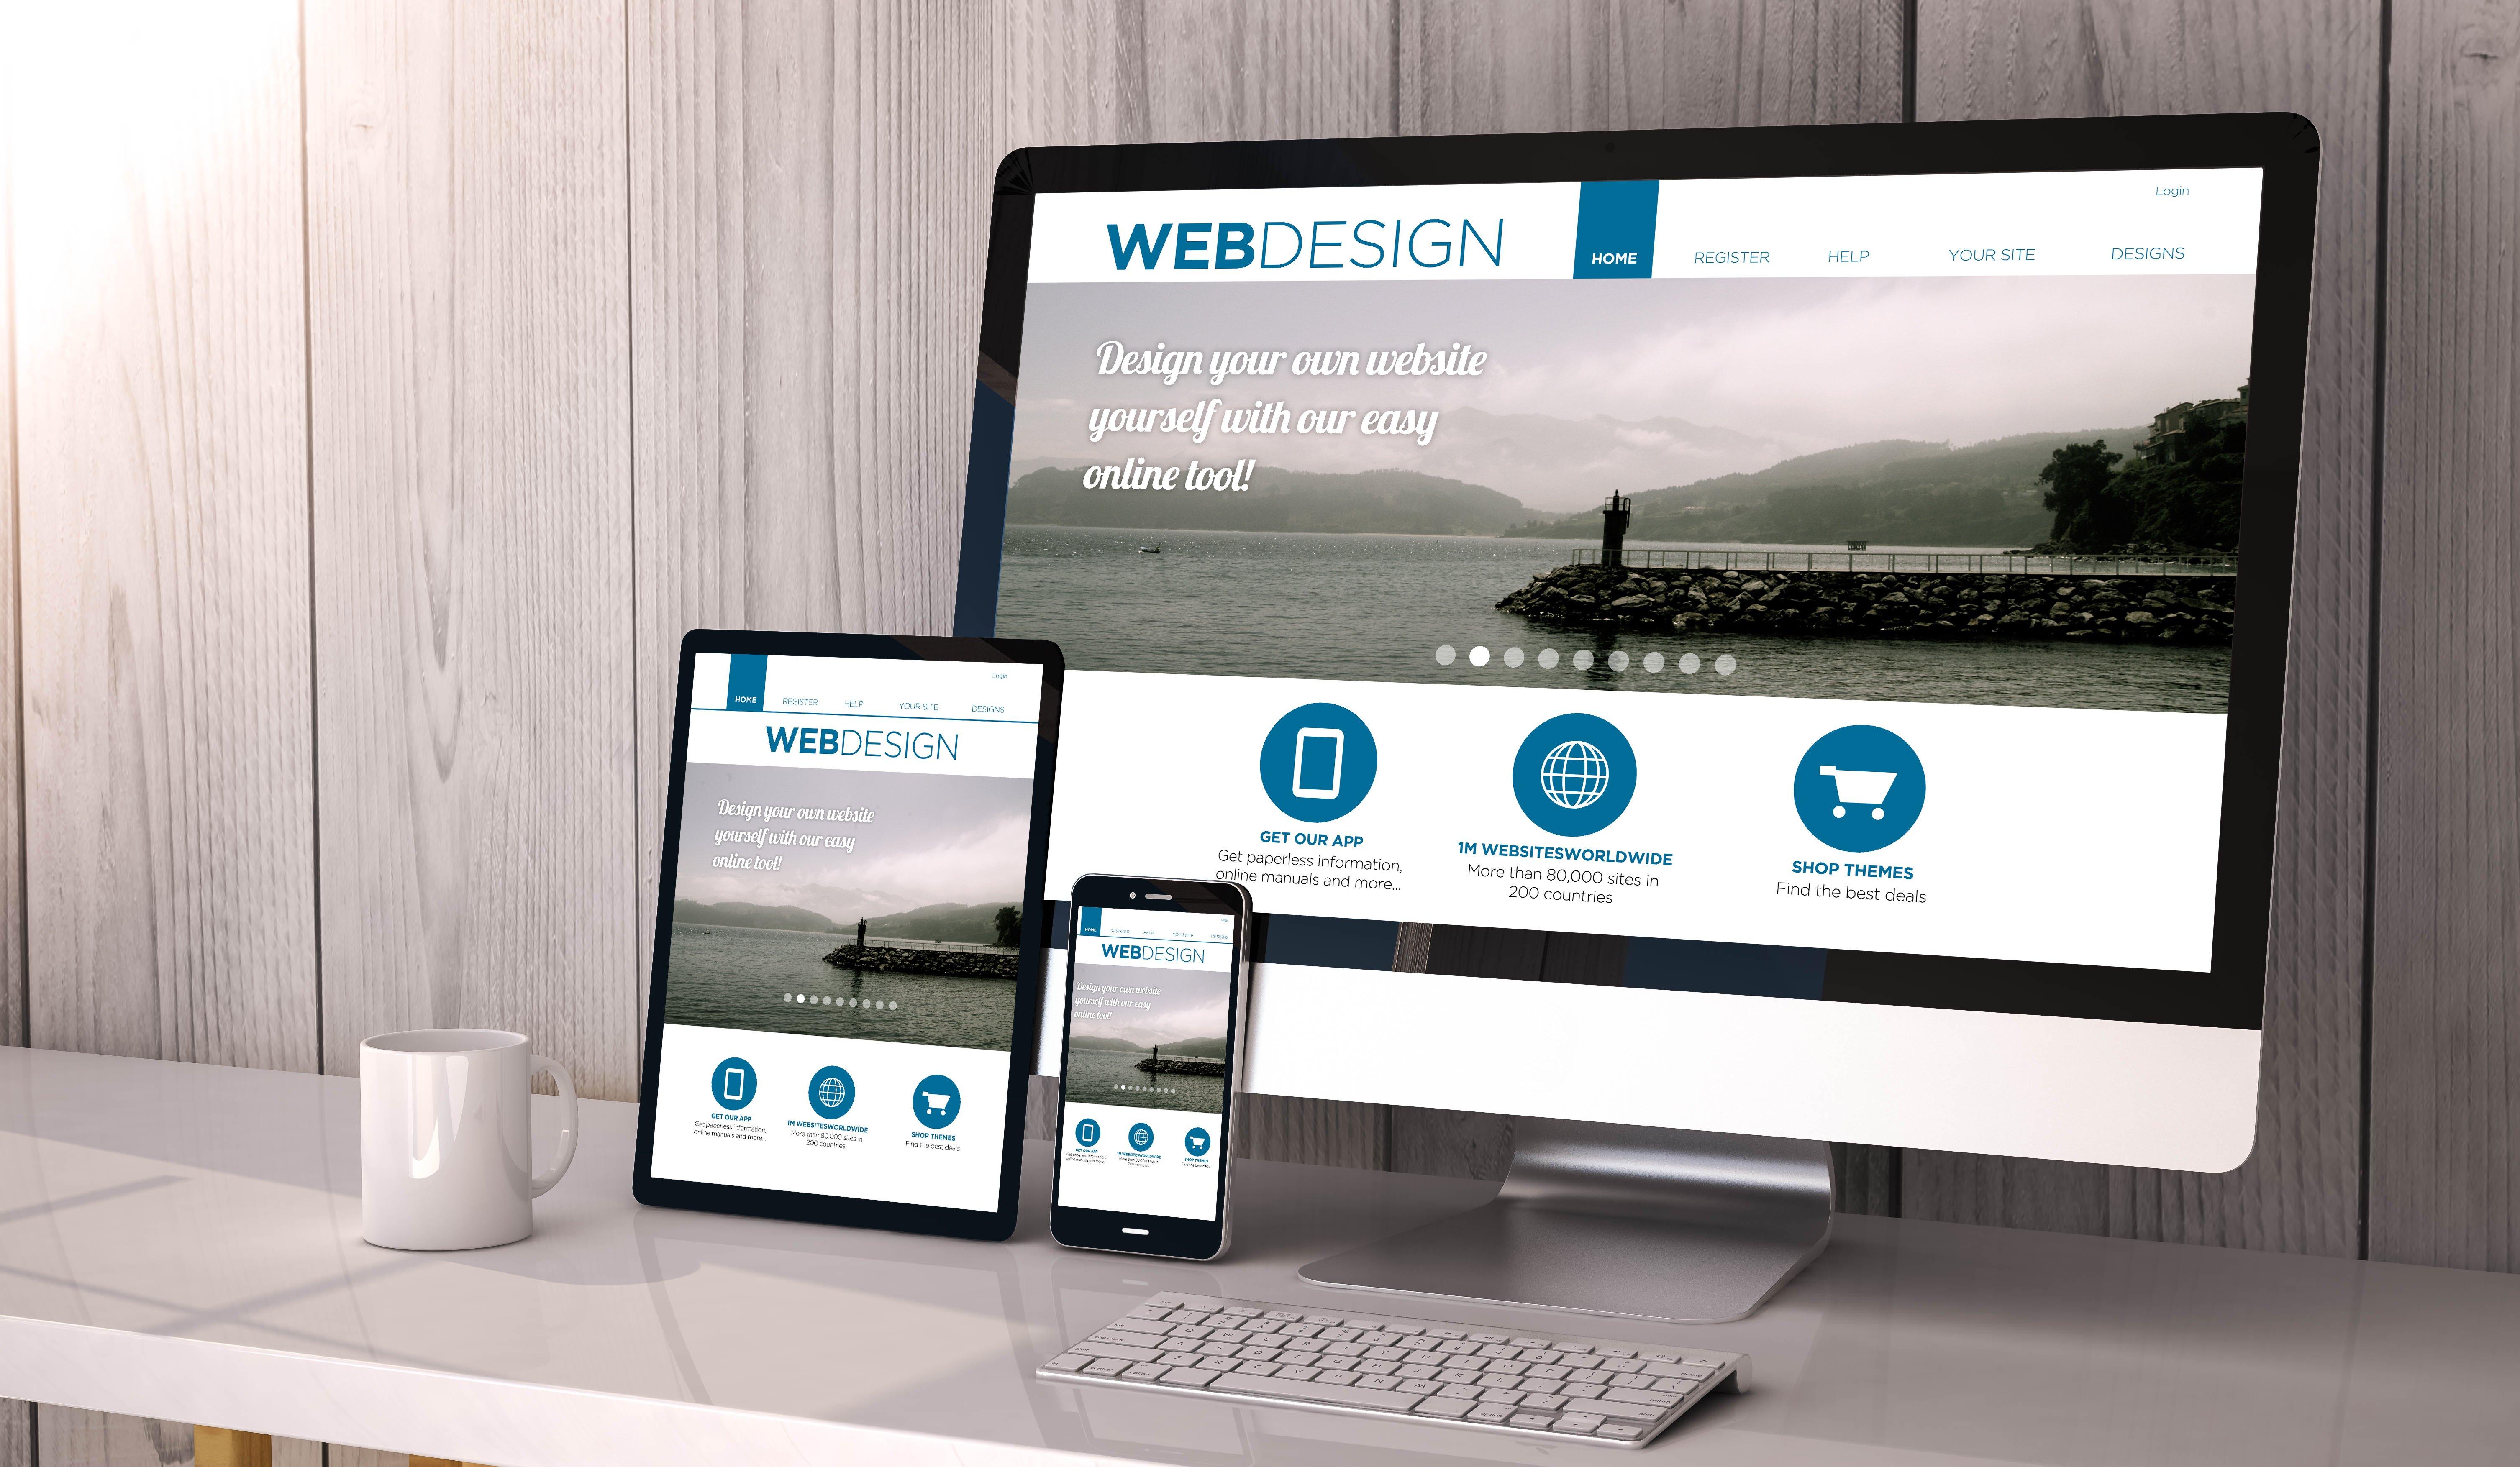 Equipment Vendor Website